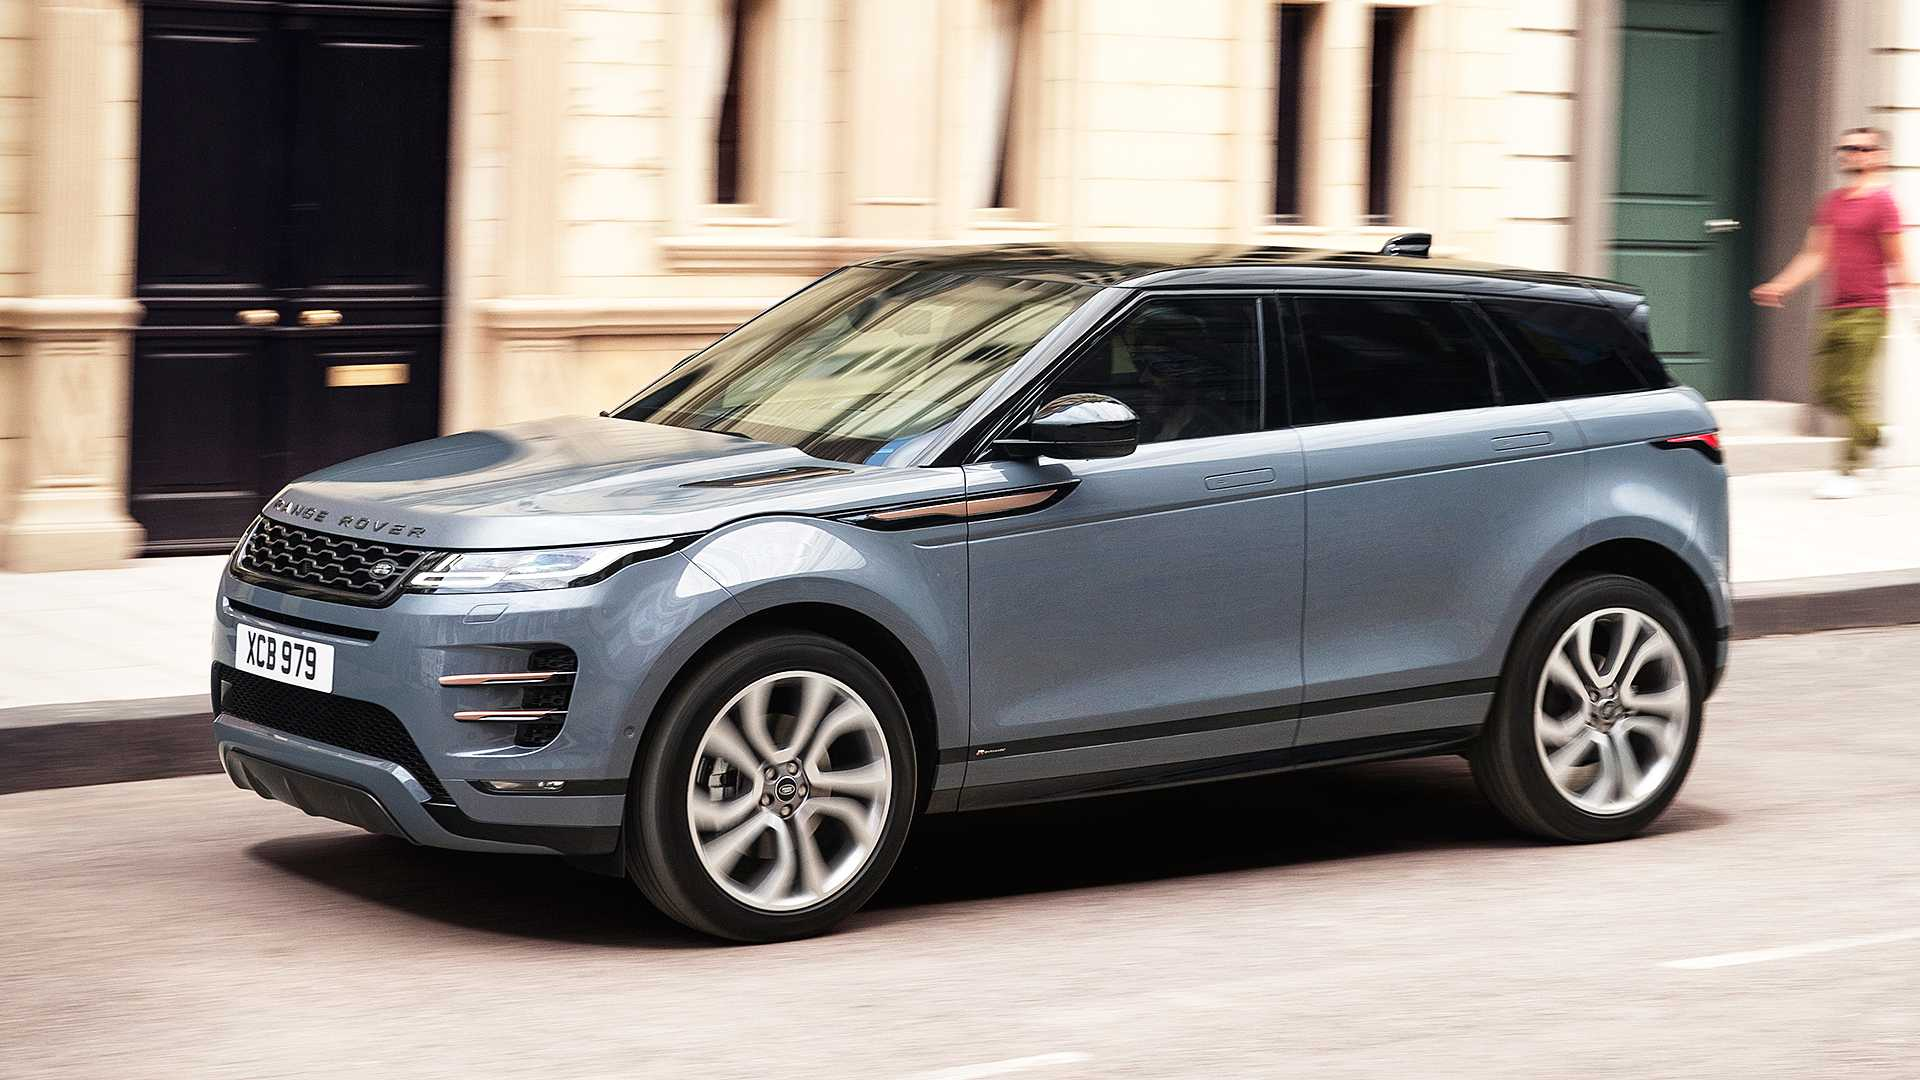 2020-range-rover-evoque.jpg